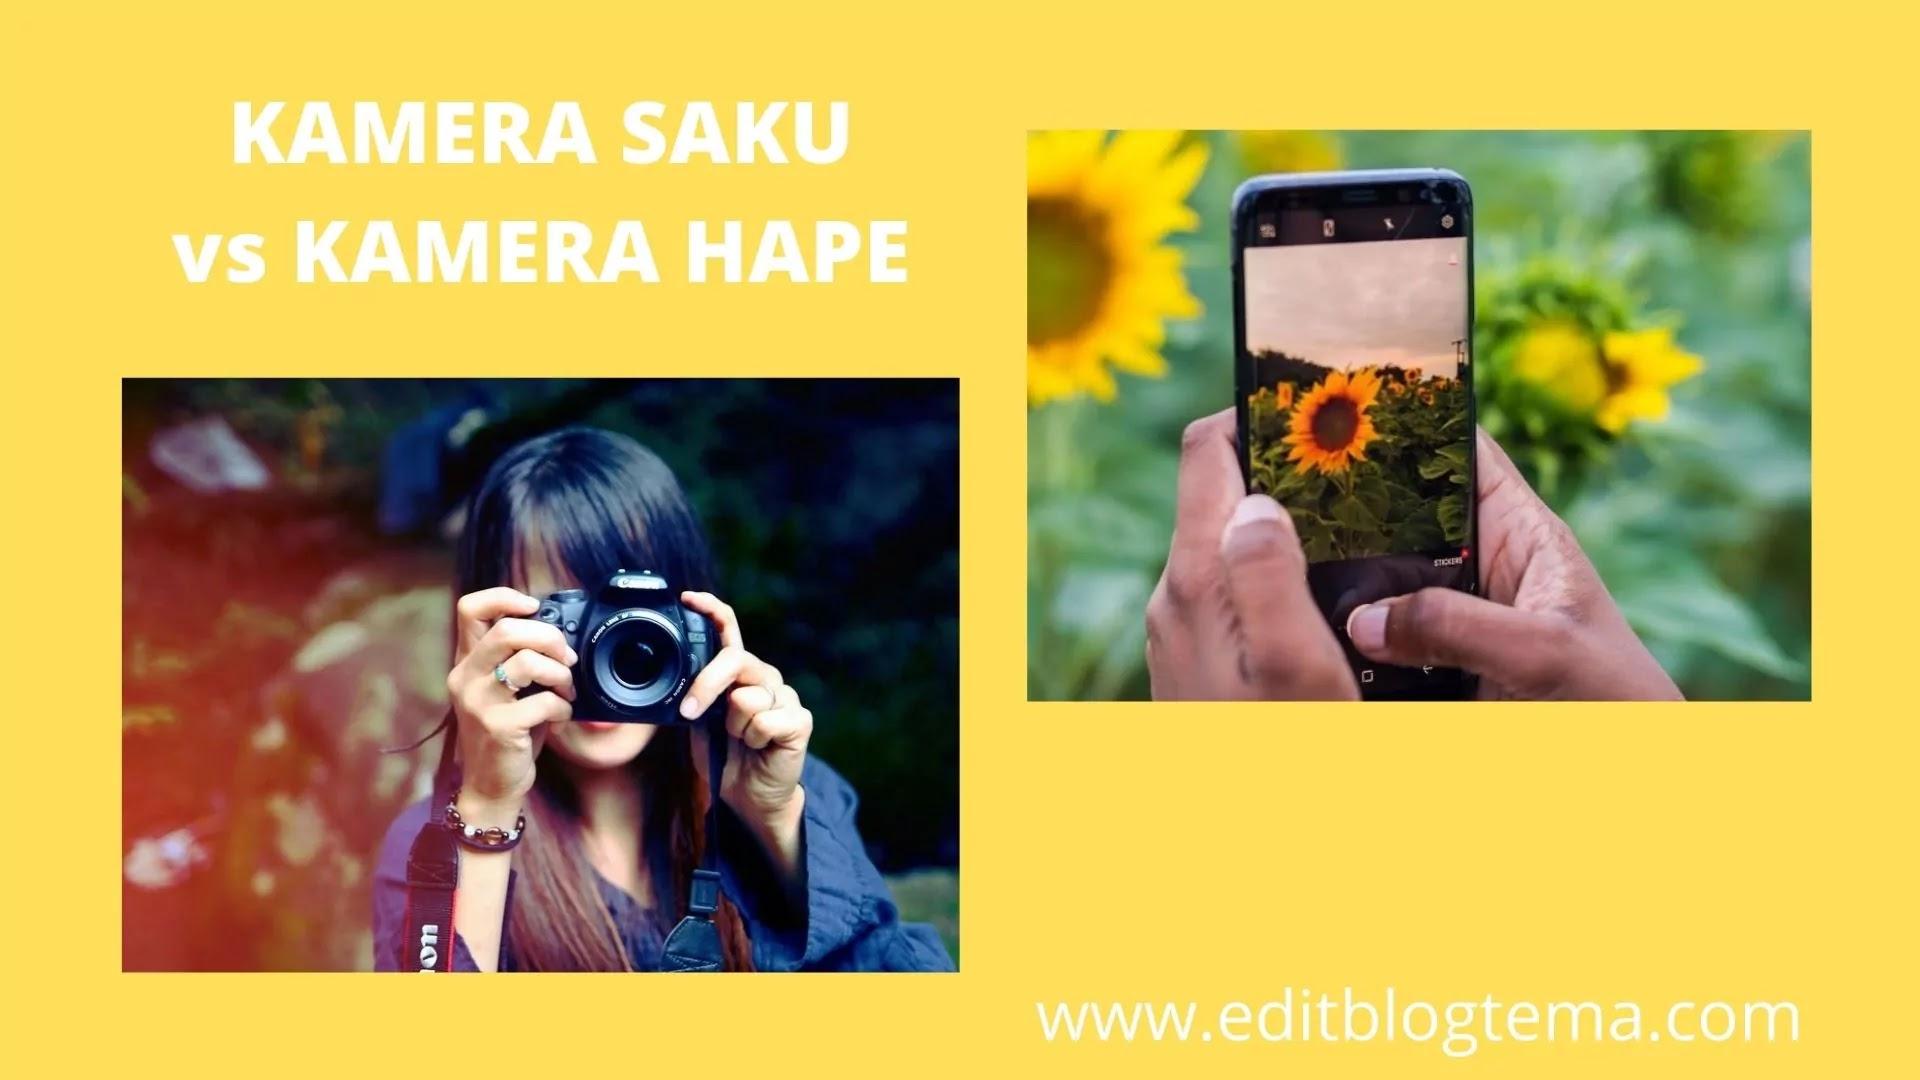 kamera hape versus kamera saku